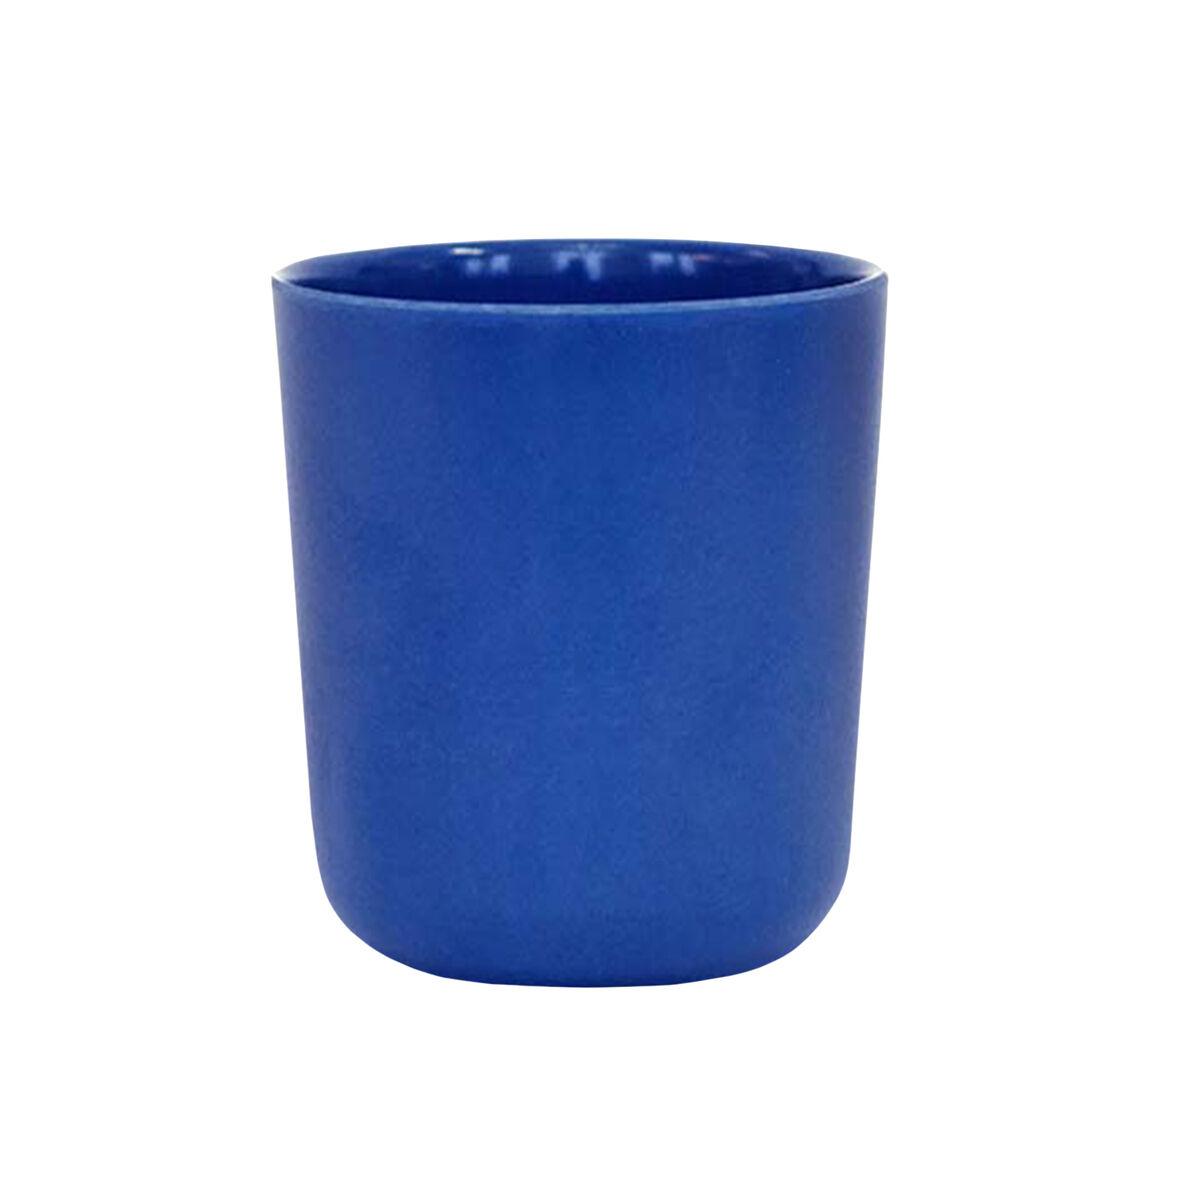 Ekobo Gusto muki, M, royal blue